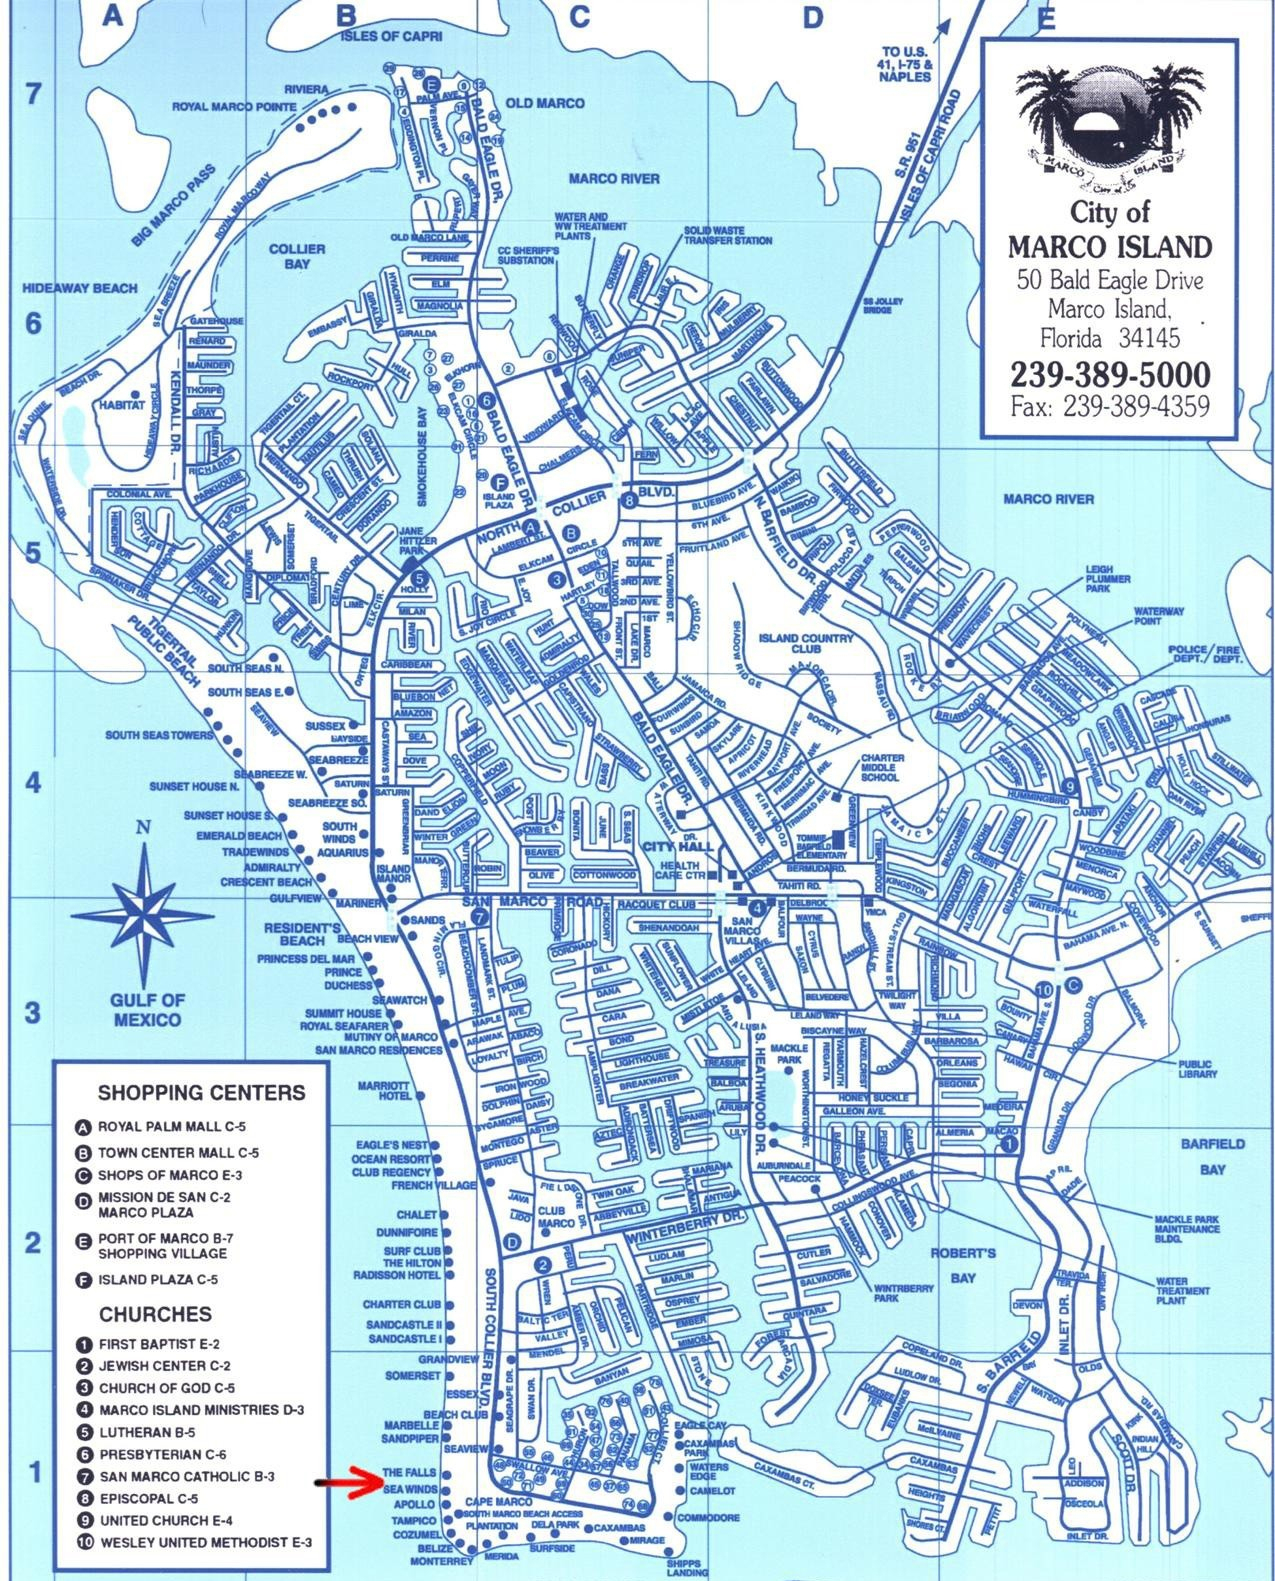 Marco Island Map Florida 0 | Safehandsit - San Marcos Island Florida Map